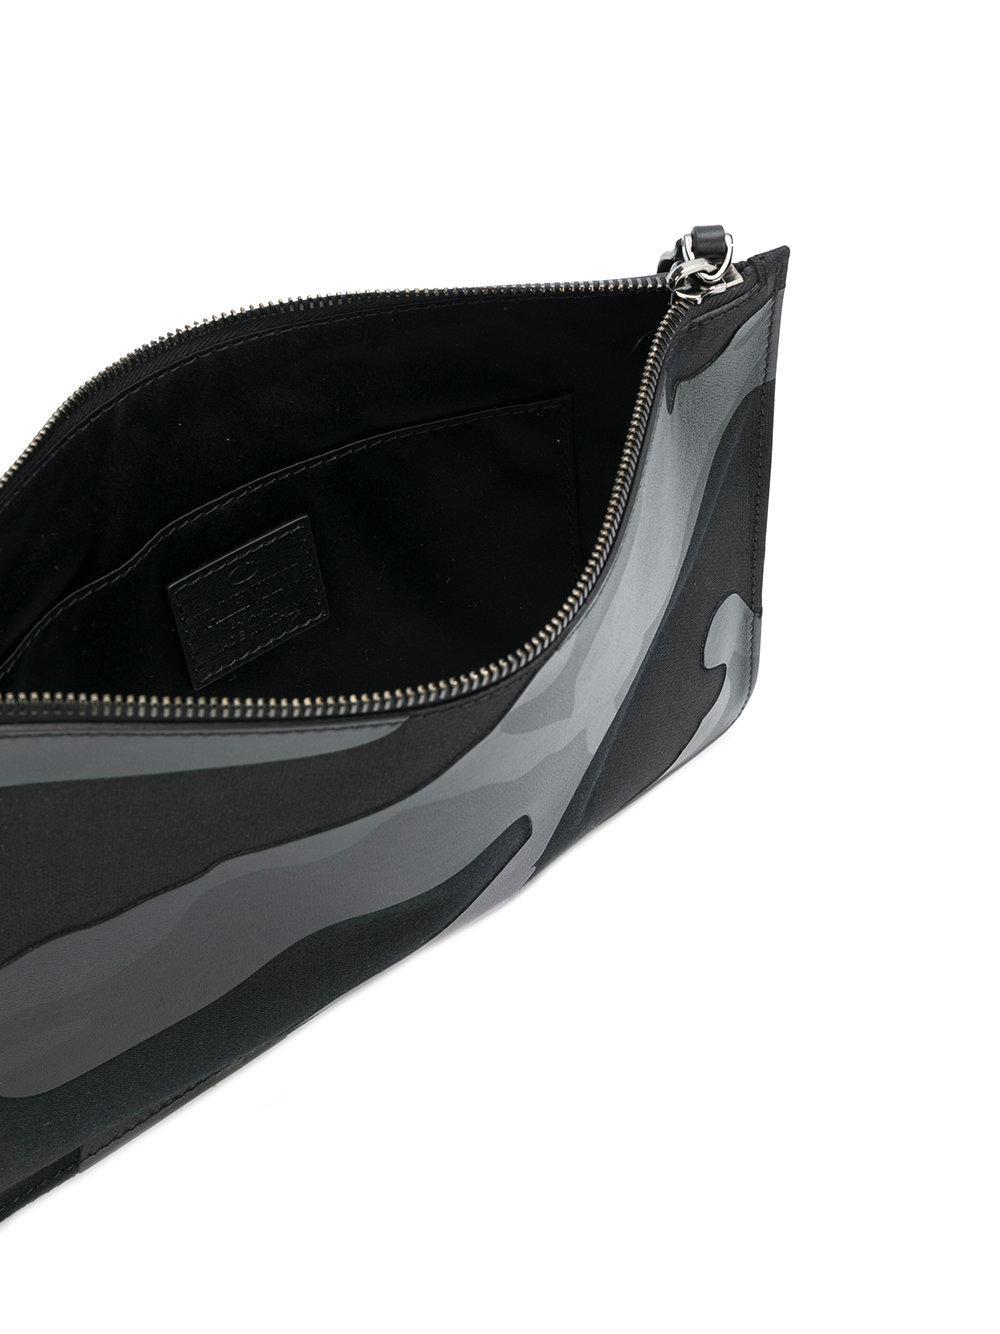 tonal camouflage clutch - Black Valentino ynQ4O1A5